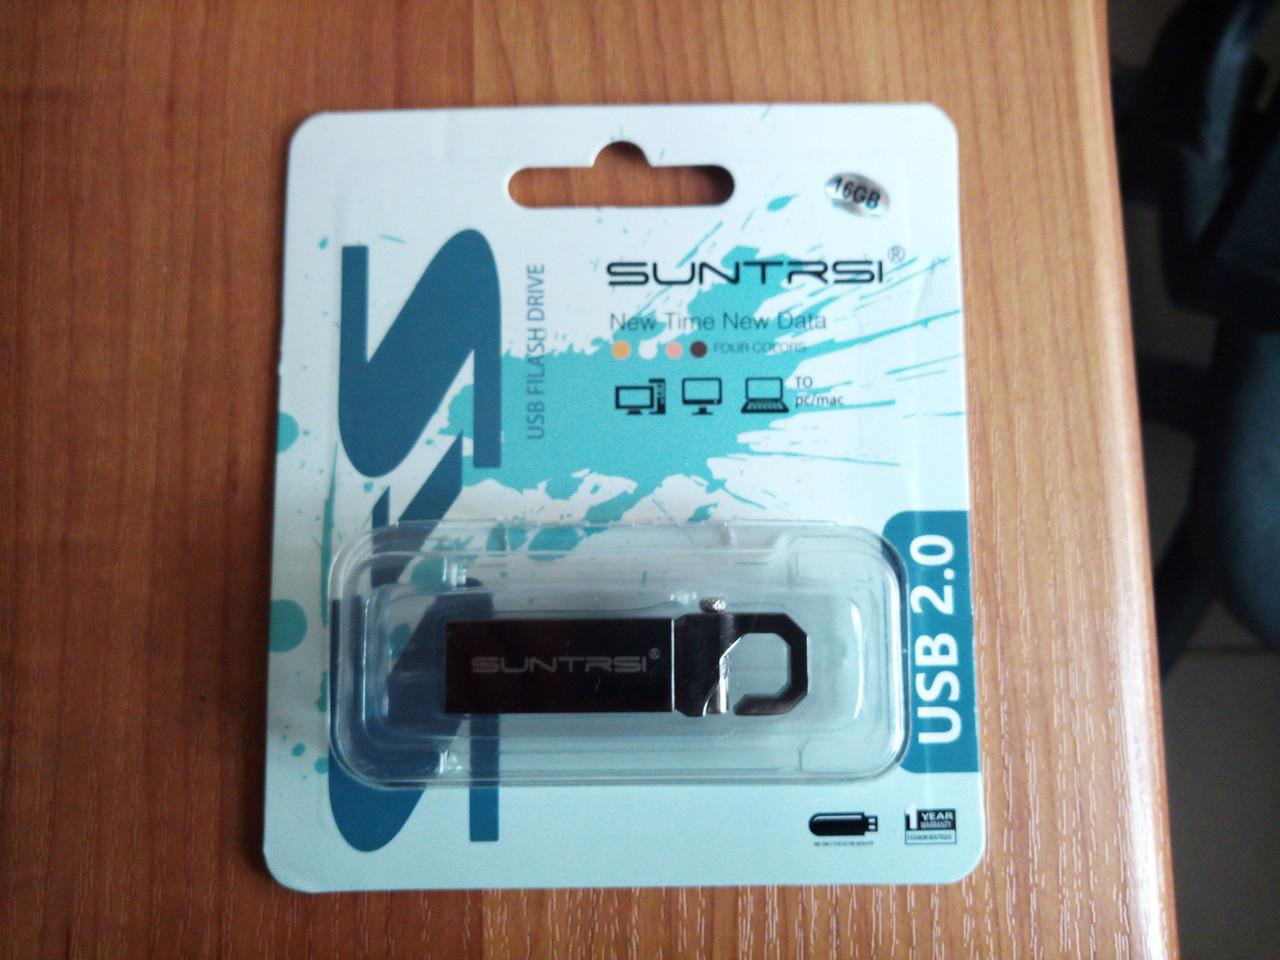 SUNTRSI USB 2.0 металлический флэш-накопитель 16 ГБ памяти